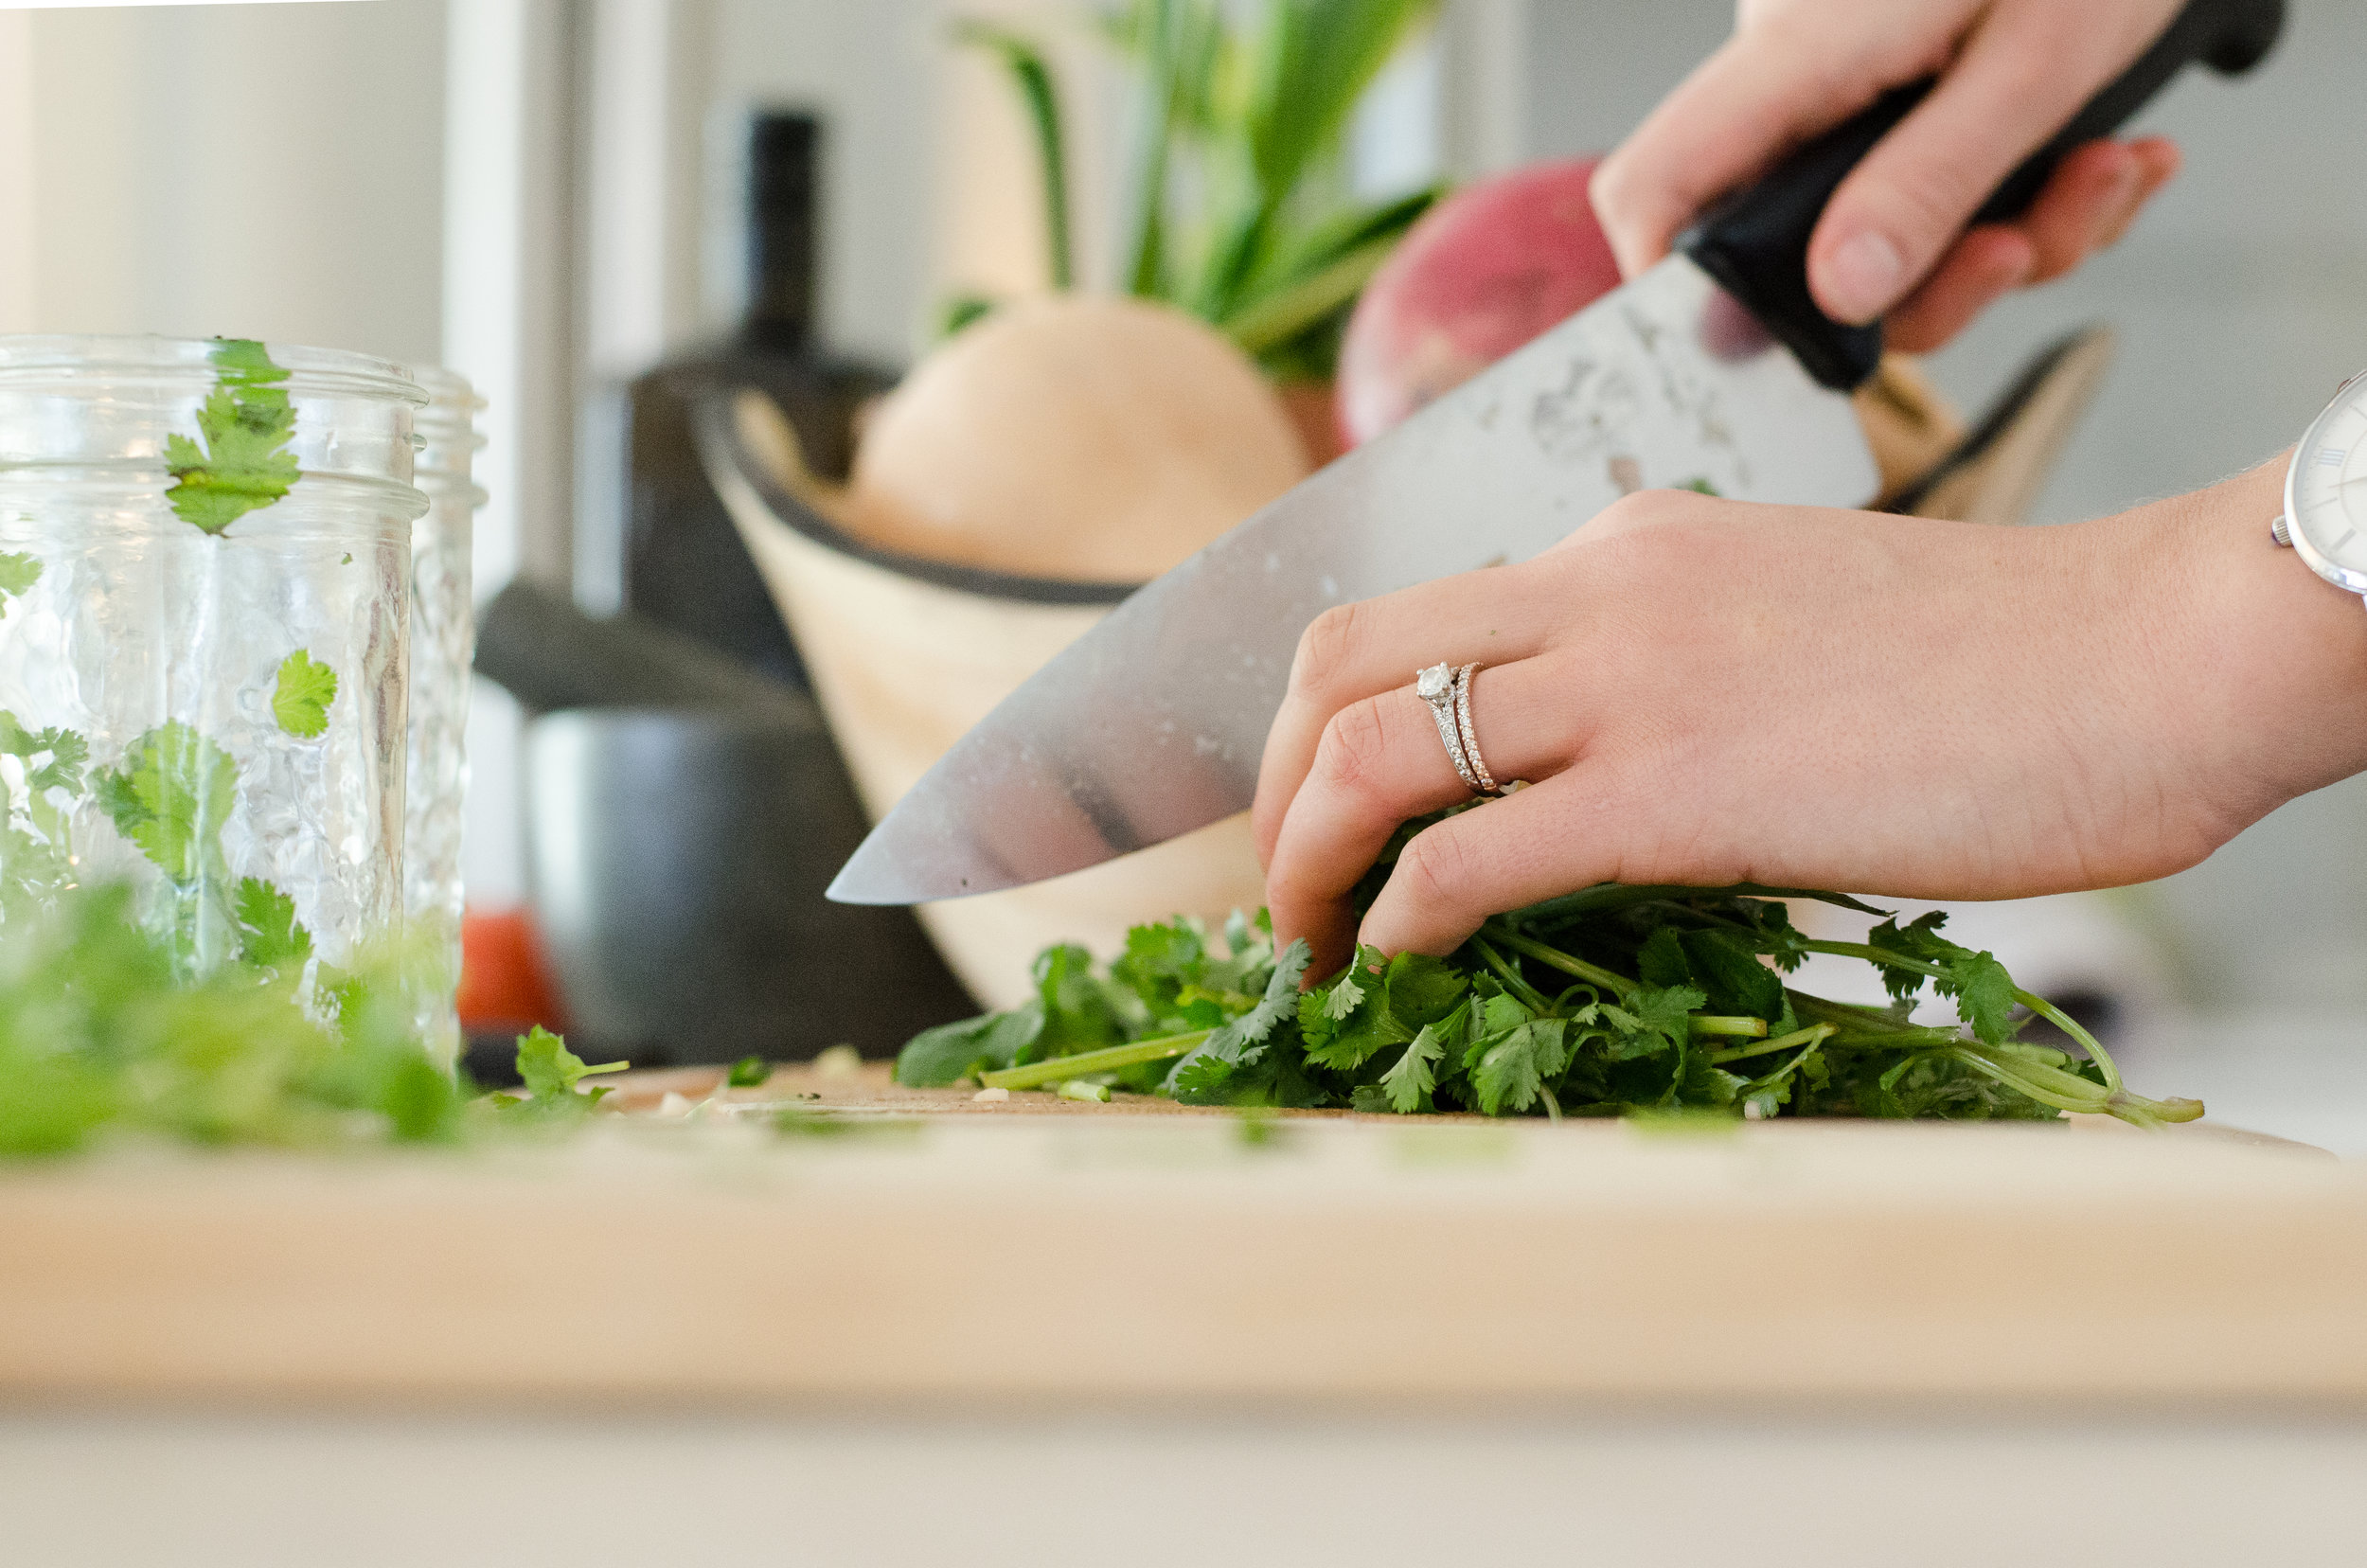 Raw Vegan Chef Program - UNCONVENTIONAL HEALING